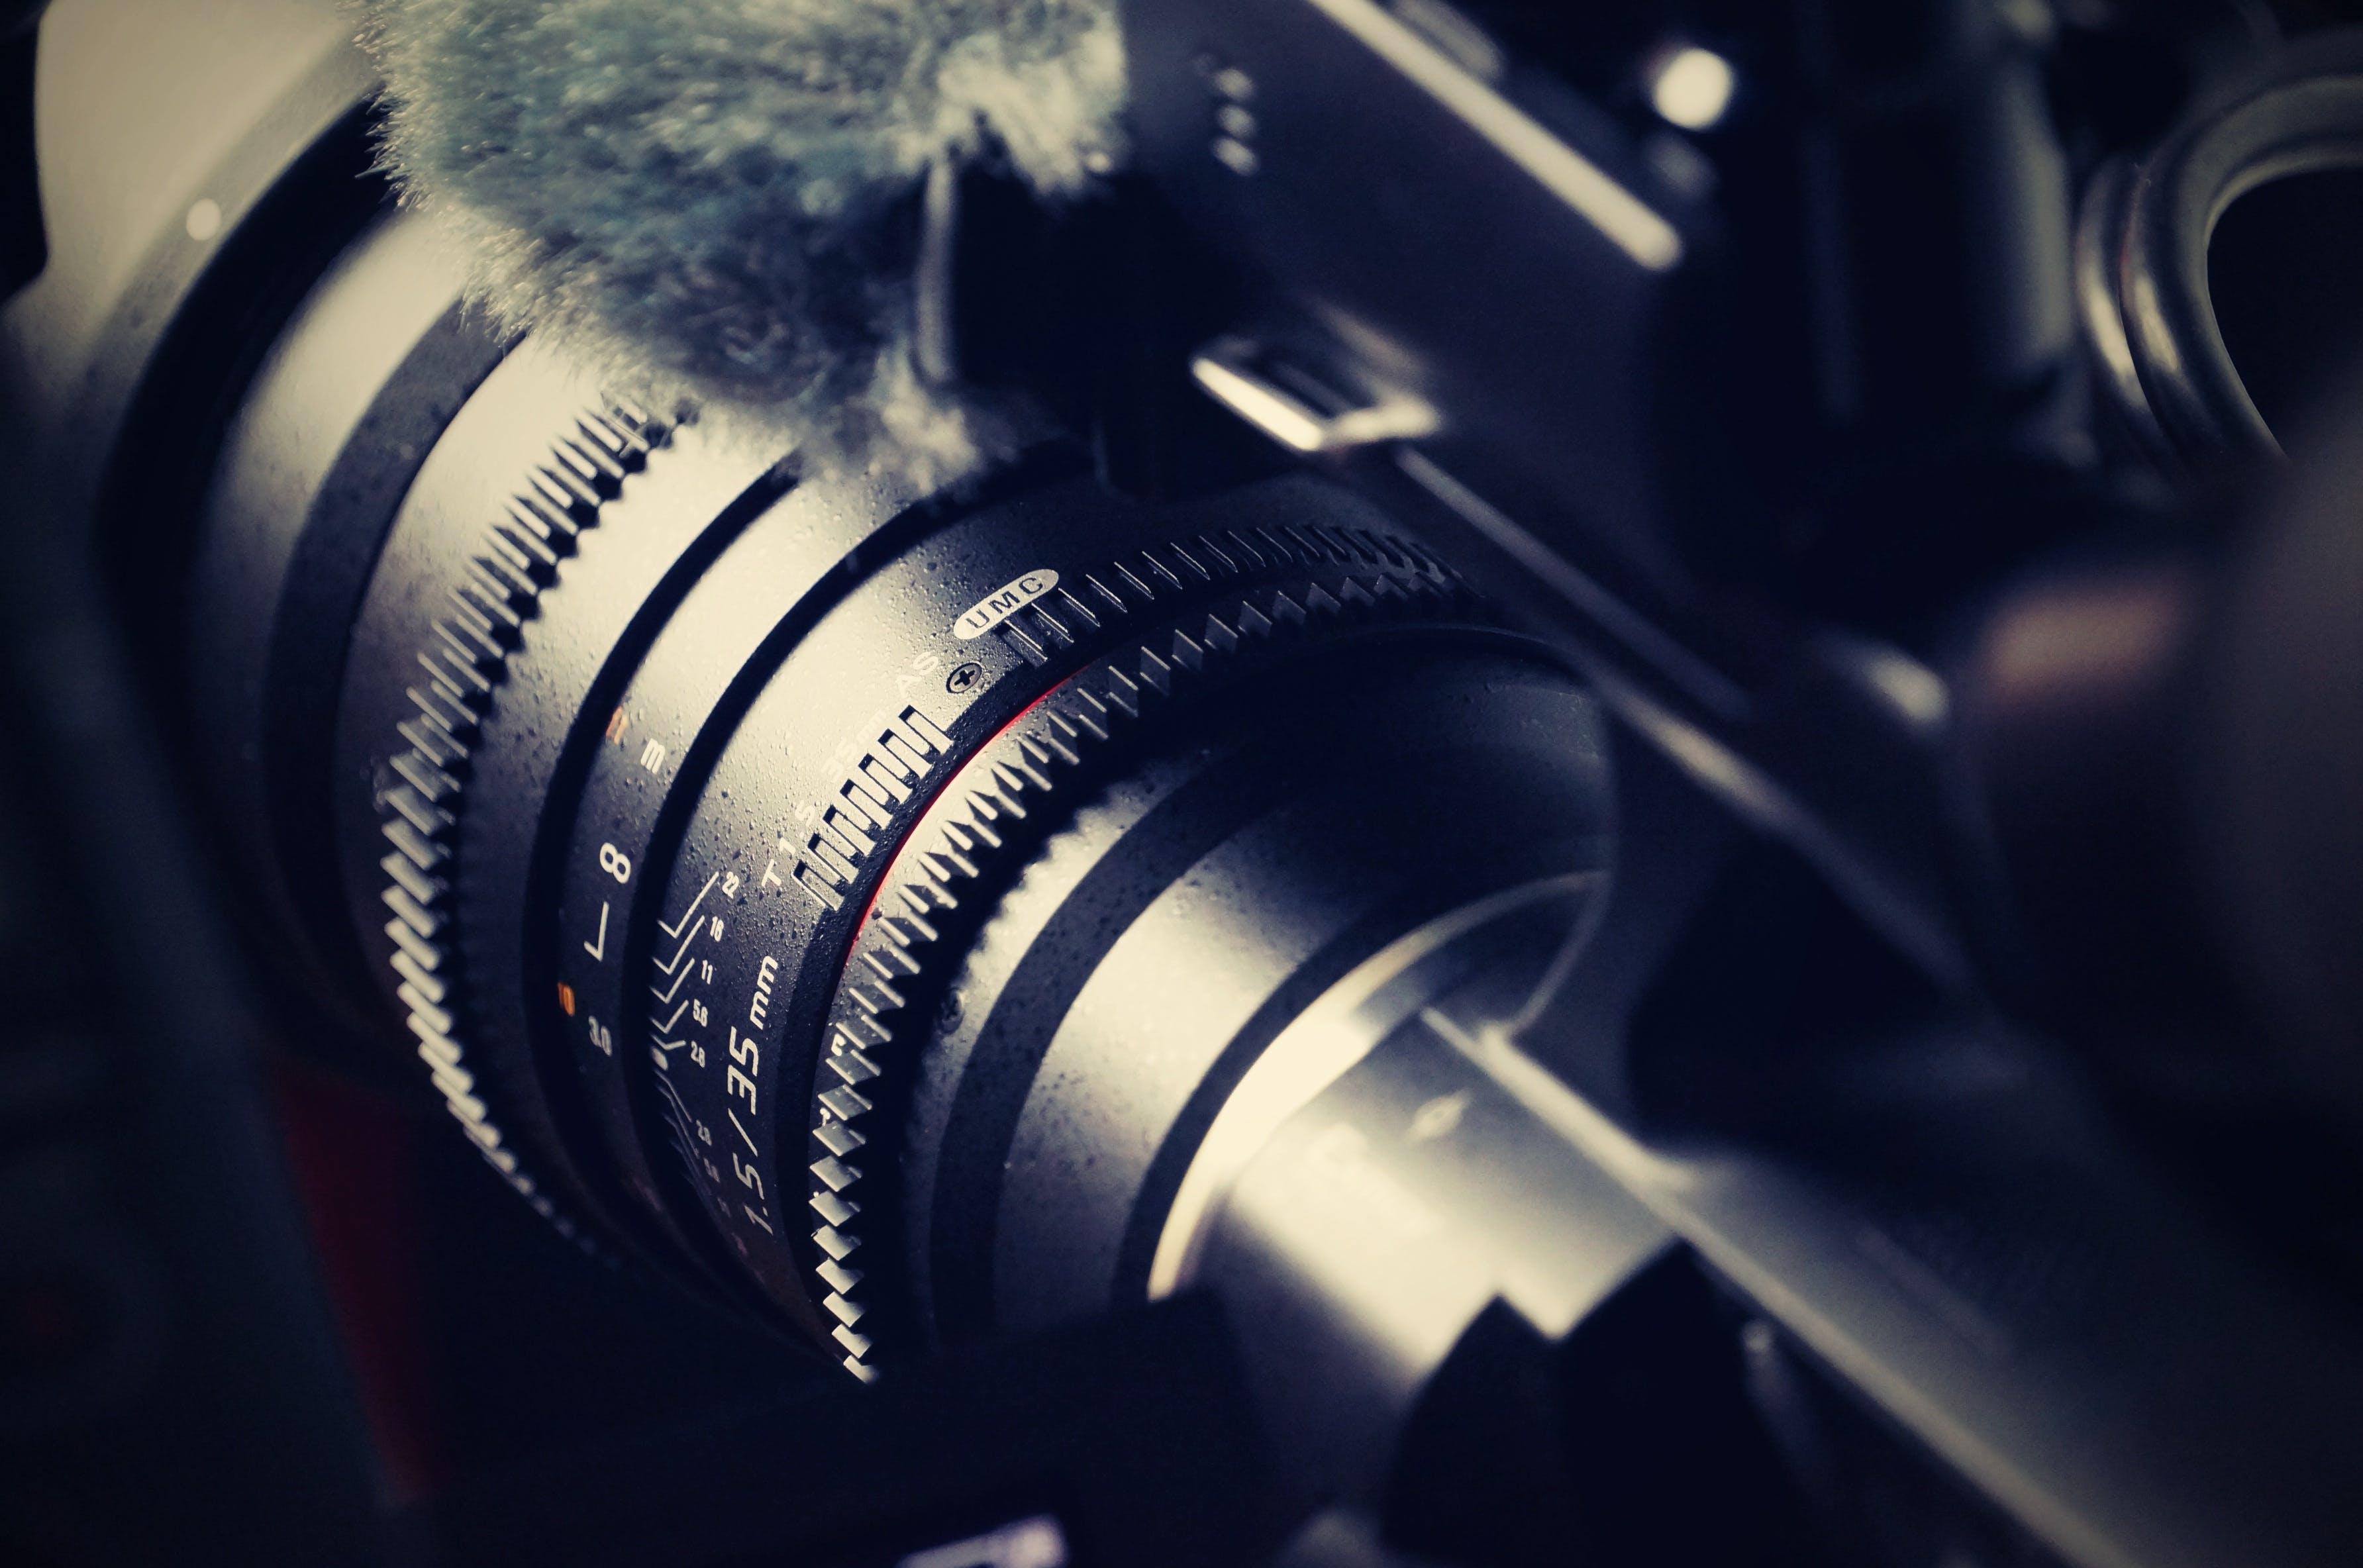 Kostenloses Stock Foto zu ausrüstung, elektrik, kamera, kameraobjektiv